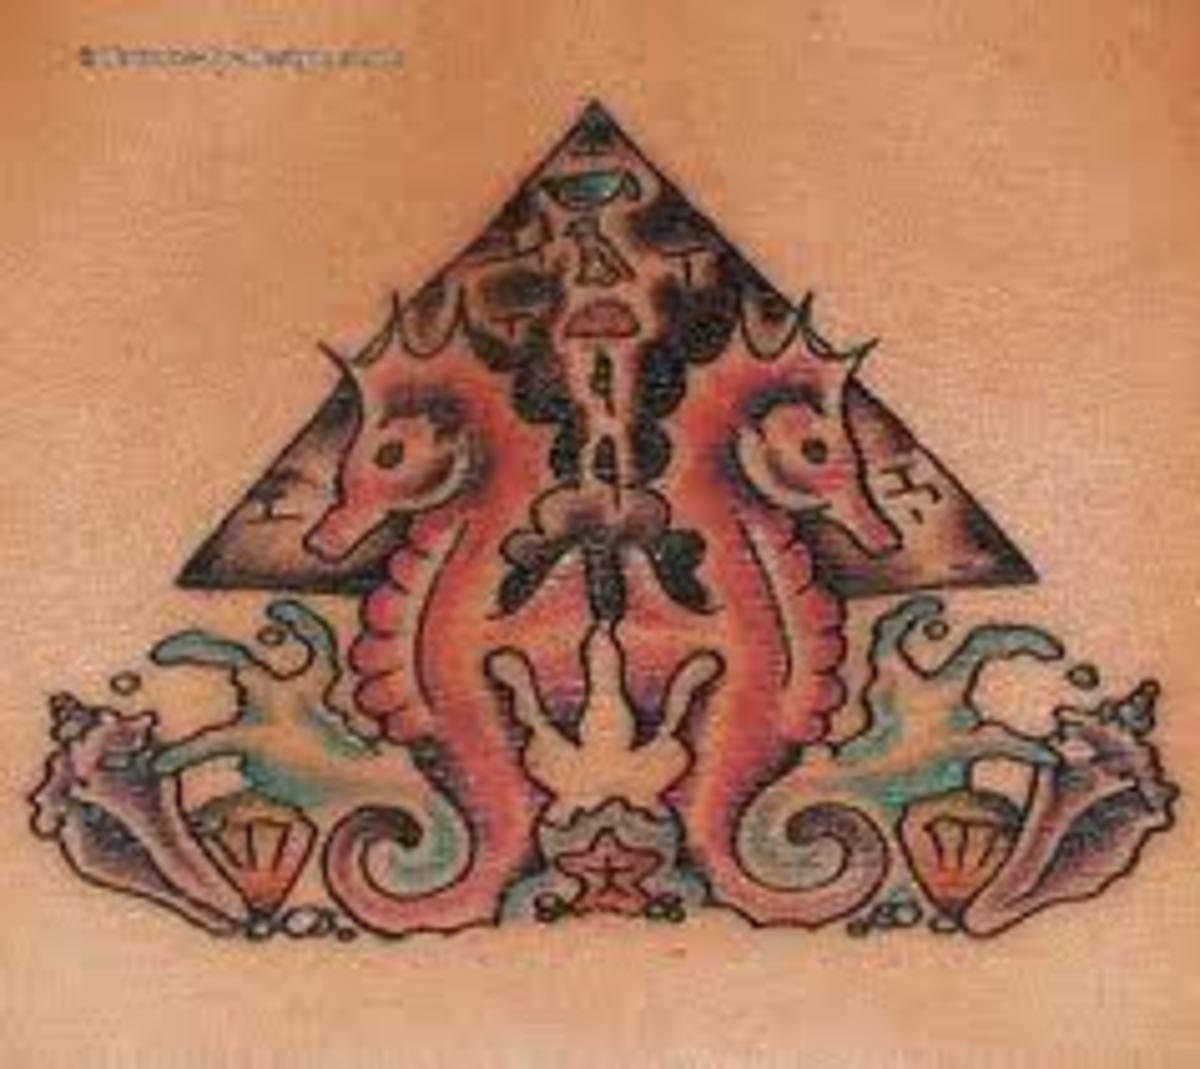 idei-dlya-tatuirovok - Татуировки пирамида: смыслы, проекты и идеи -  - фото